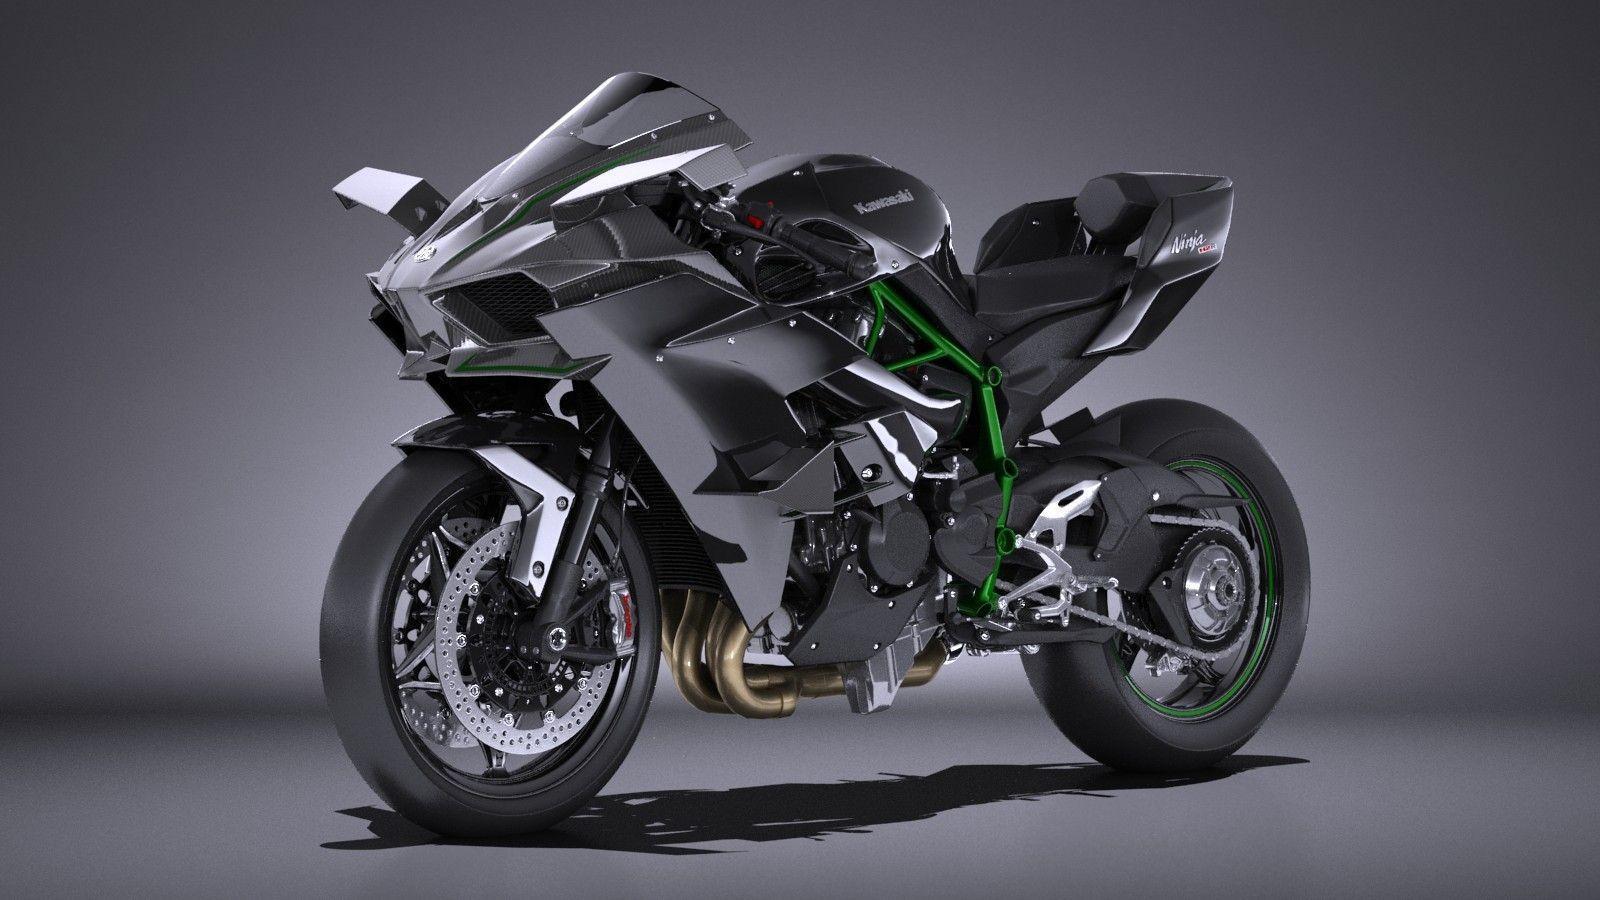 New 2016 Kawasaki Ninja H2R HD Wallpapers - All Latest New & Old ...